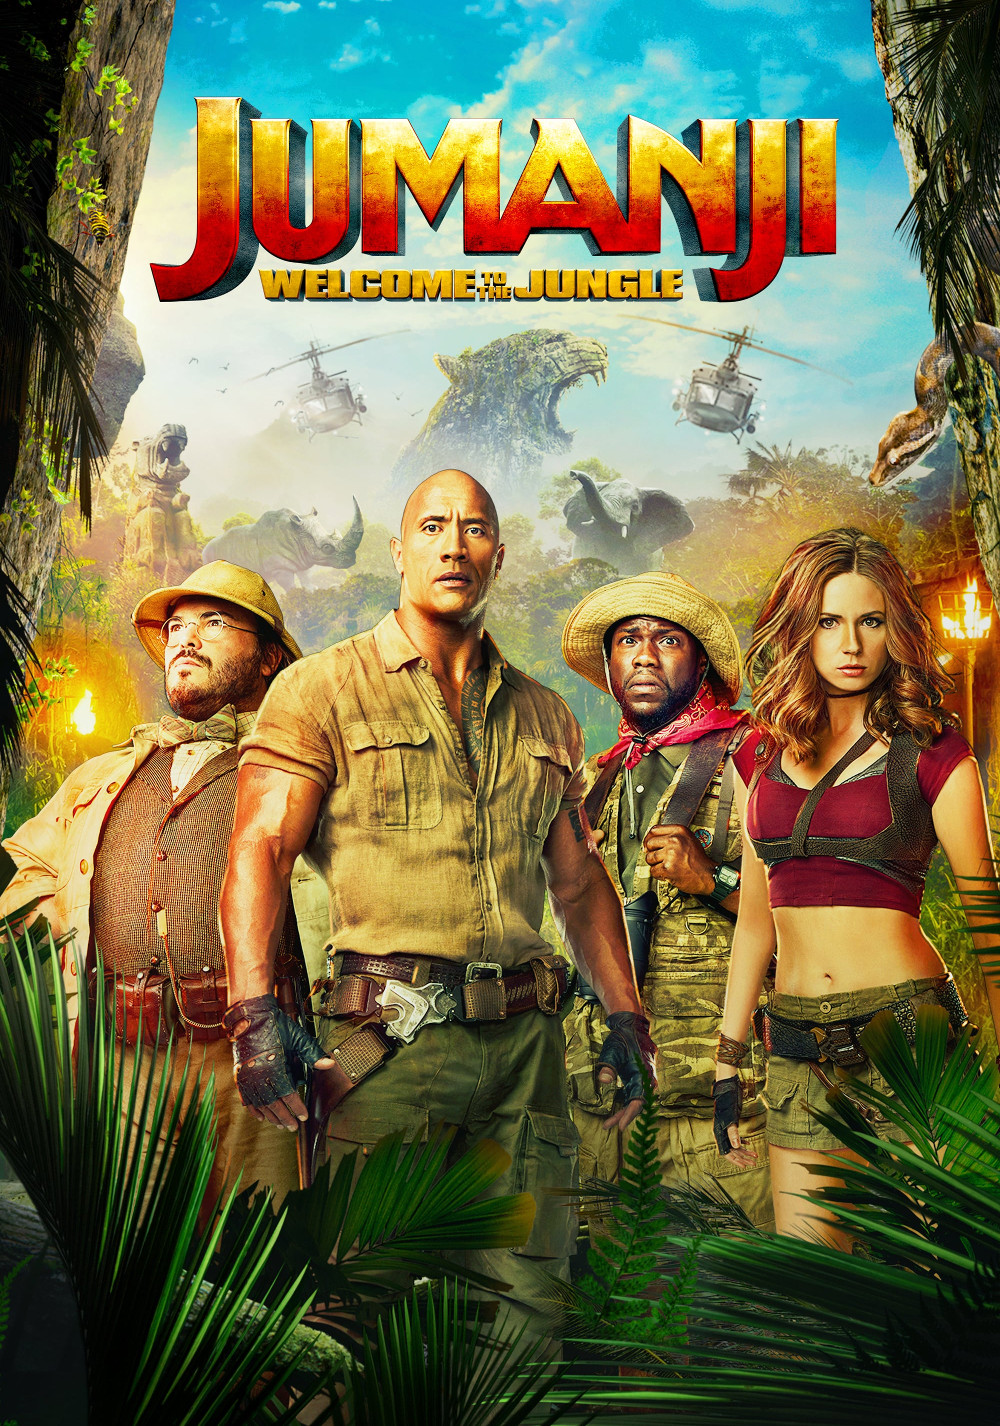 Jumanji Welcome To The Jungle 2017 Film Probe